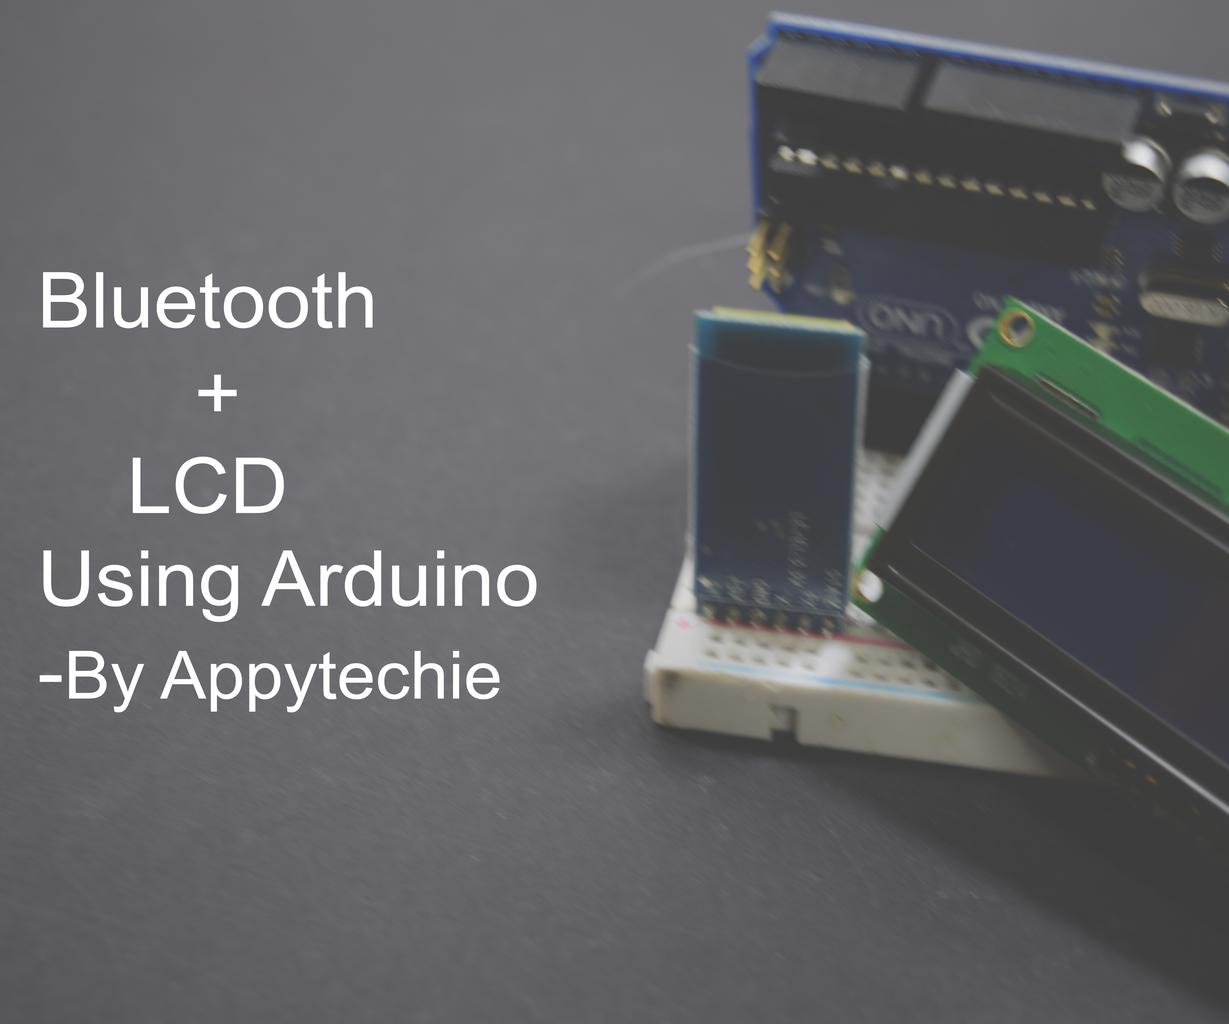 LCD Display Via Bluetooth